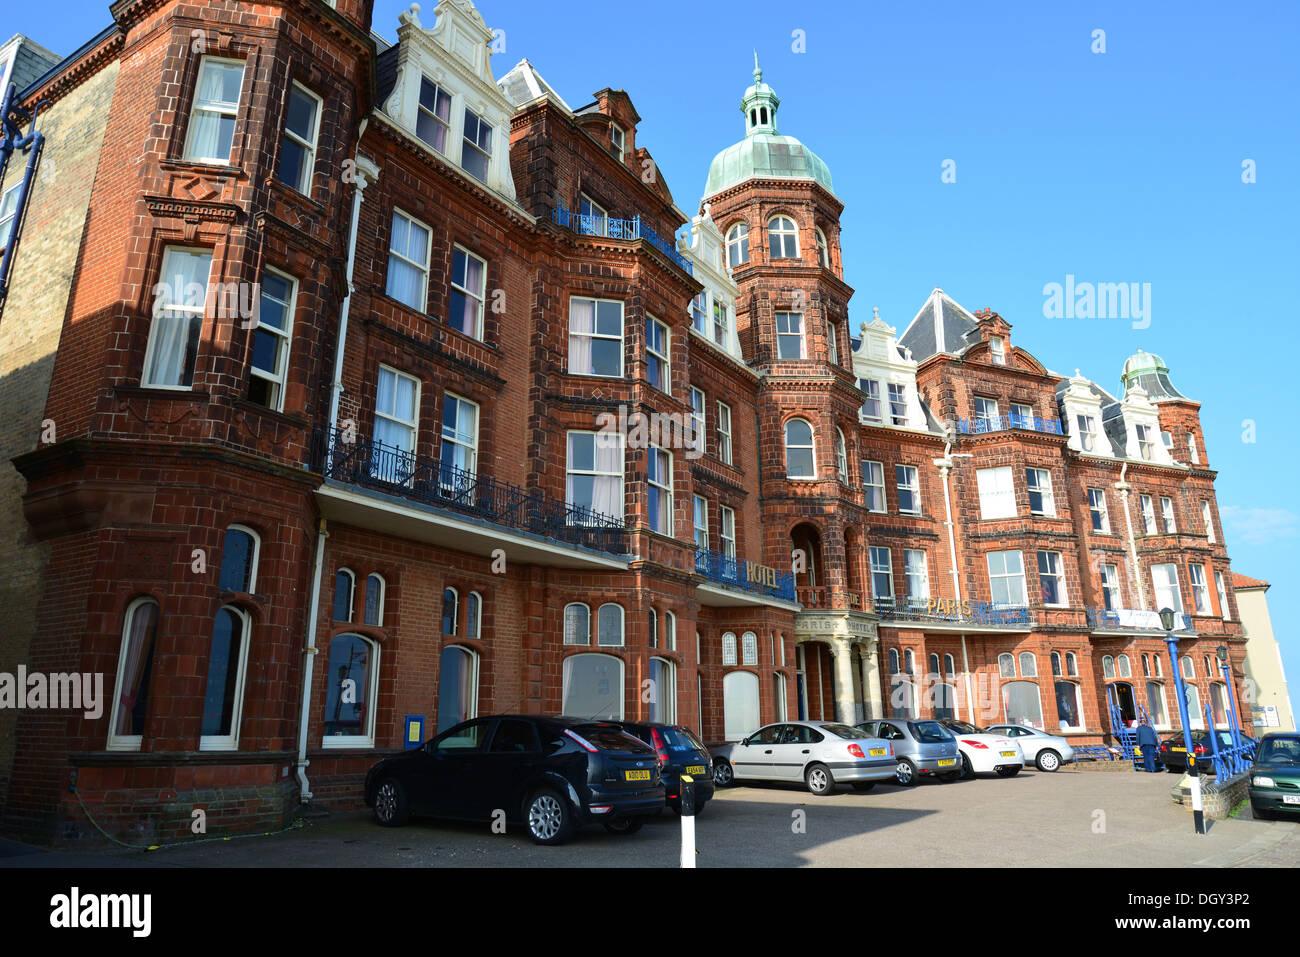 Hotel de Paris on seafront, Cromer, Norfolk, England, United Kingdom England, United Kingdom Stock Photo